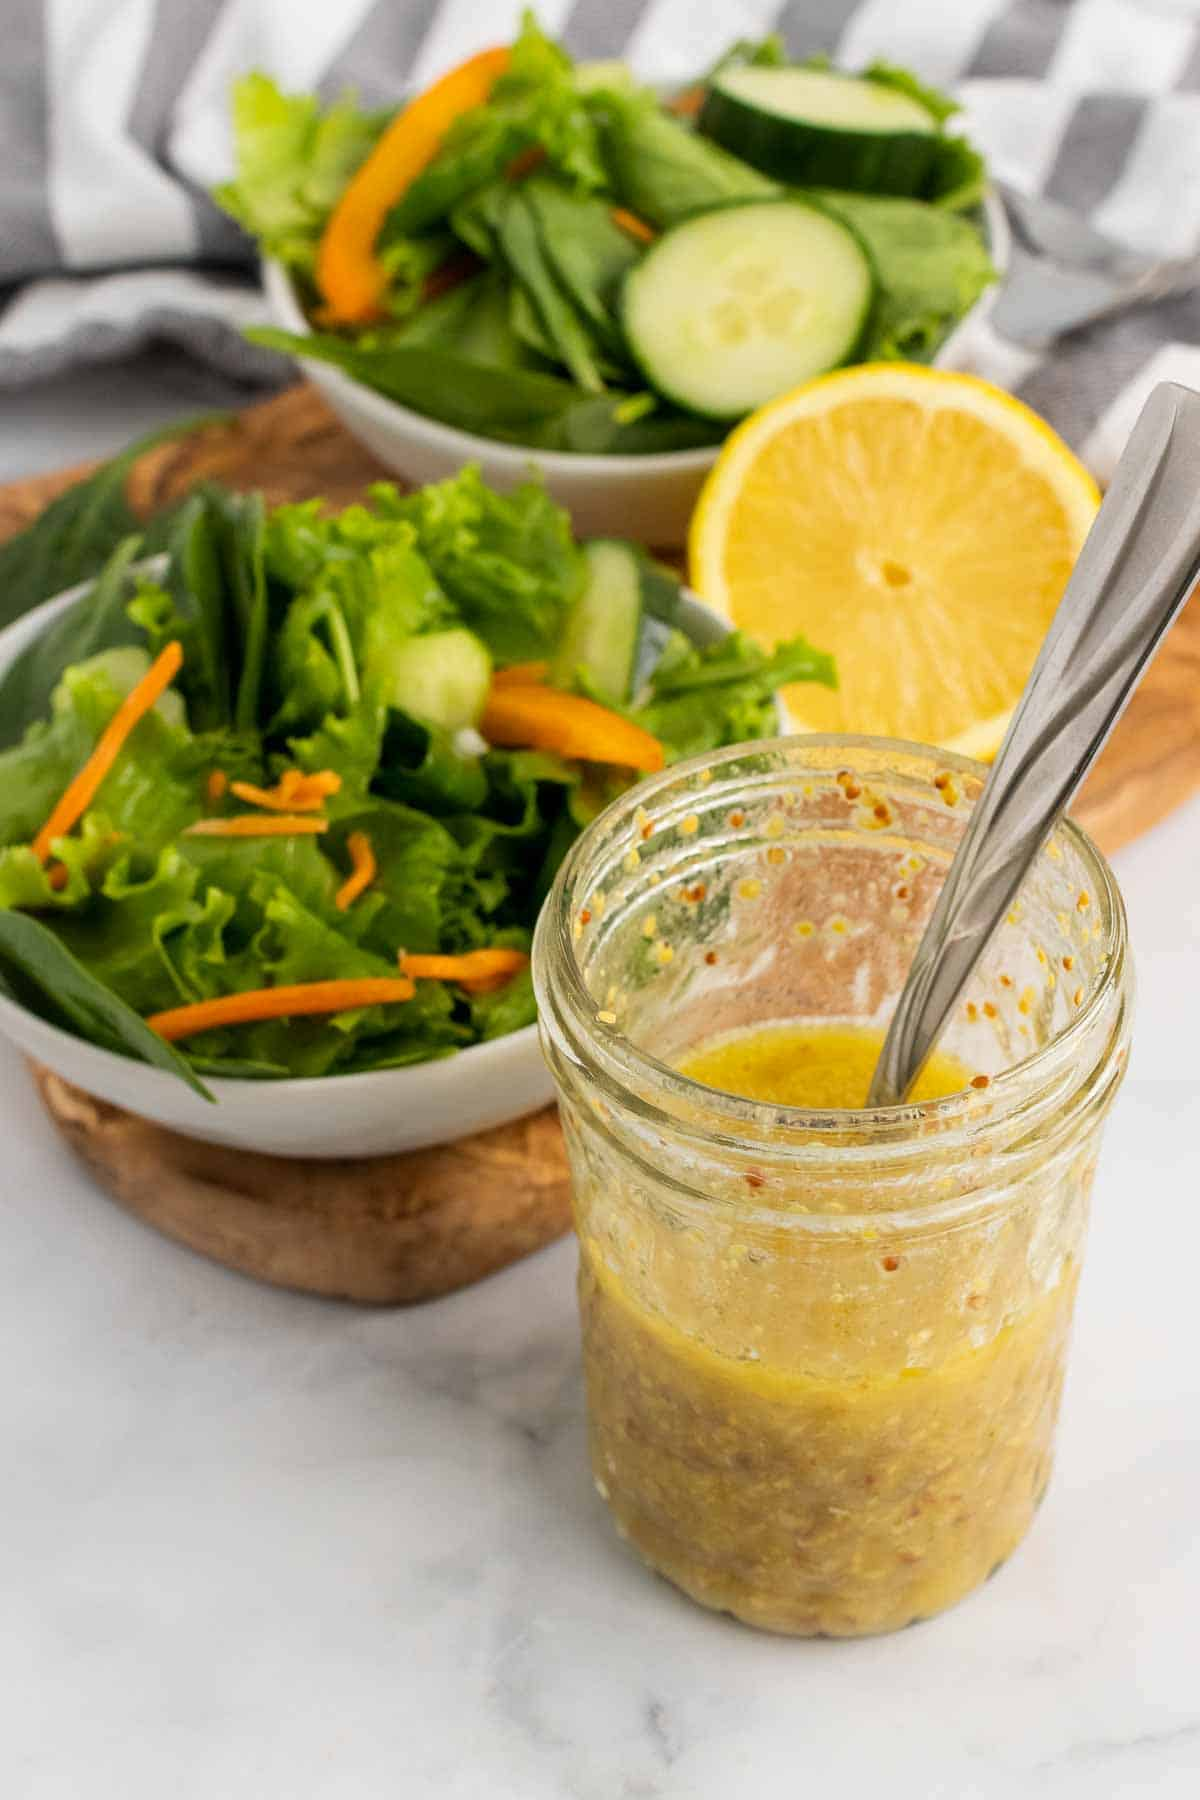 Glass jar of lemon vinaigrette in front of salad bowl